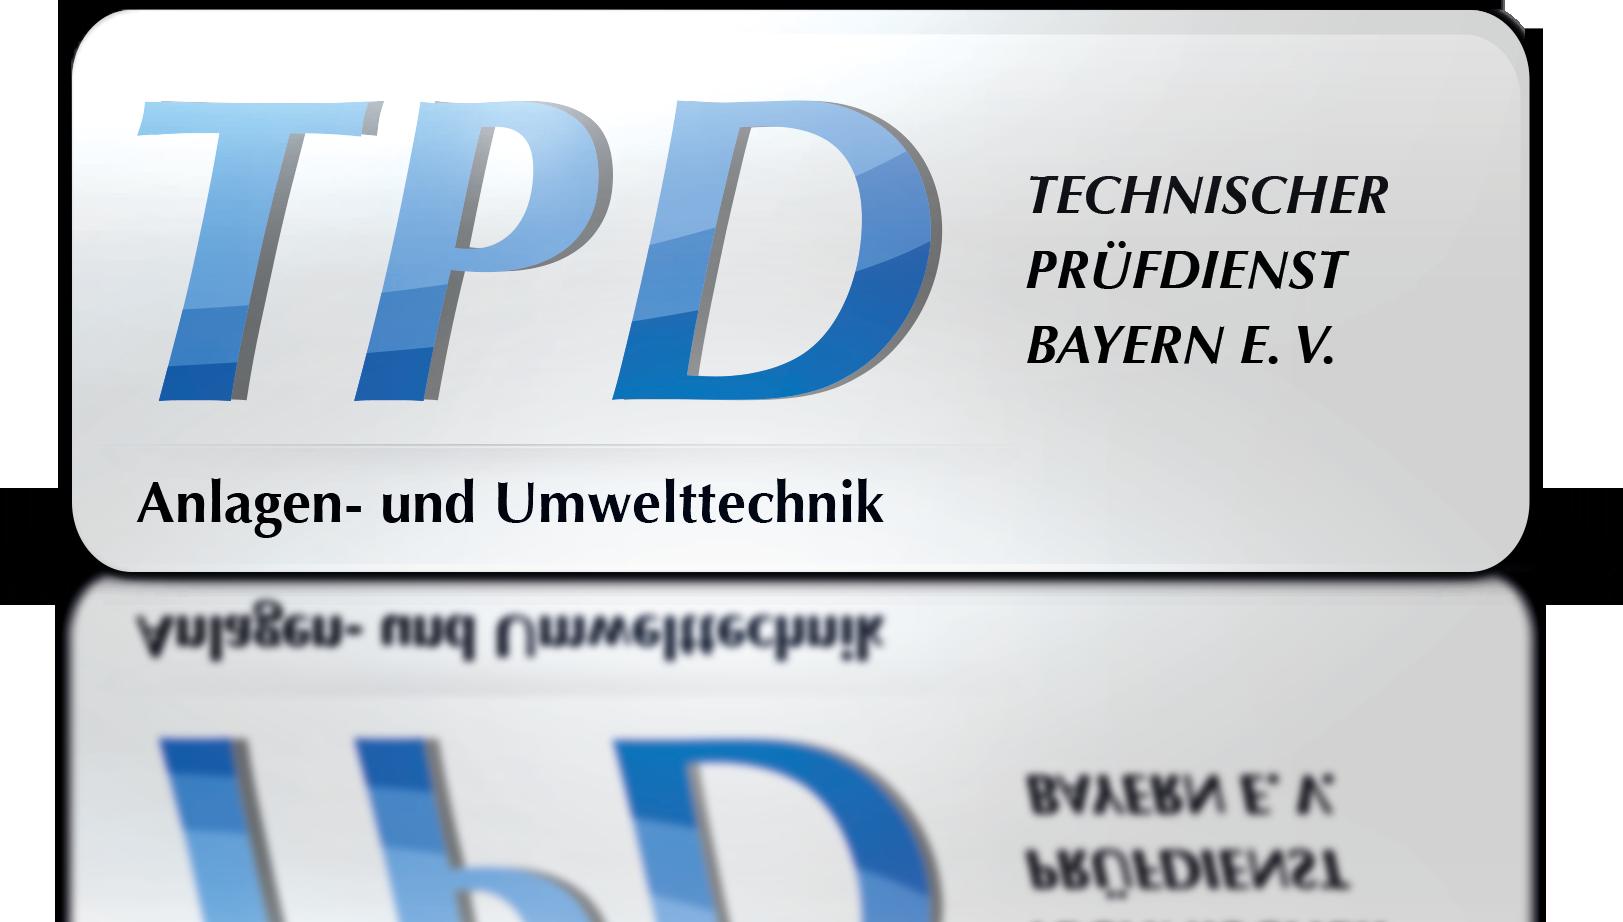 Zertifikat vom Technischer Prüfdienst Bayern e.V